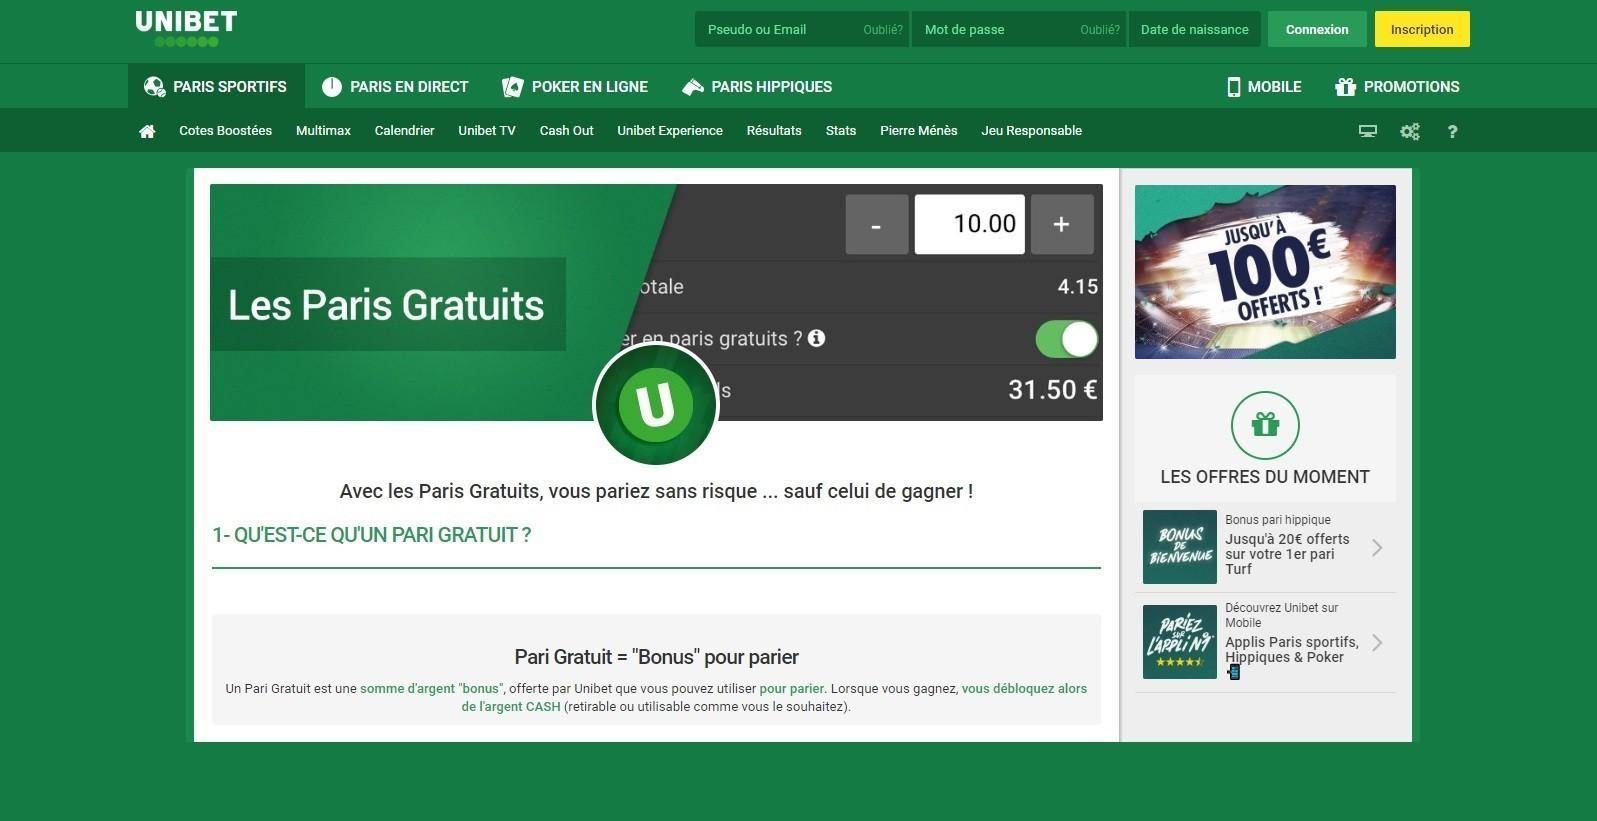 Obtenir Paris Gratuits Unibet - Freebet